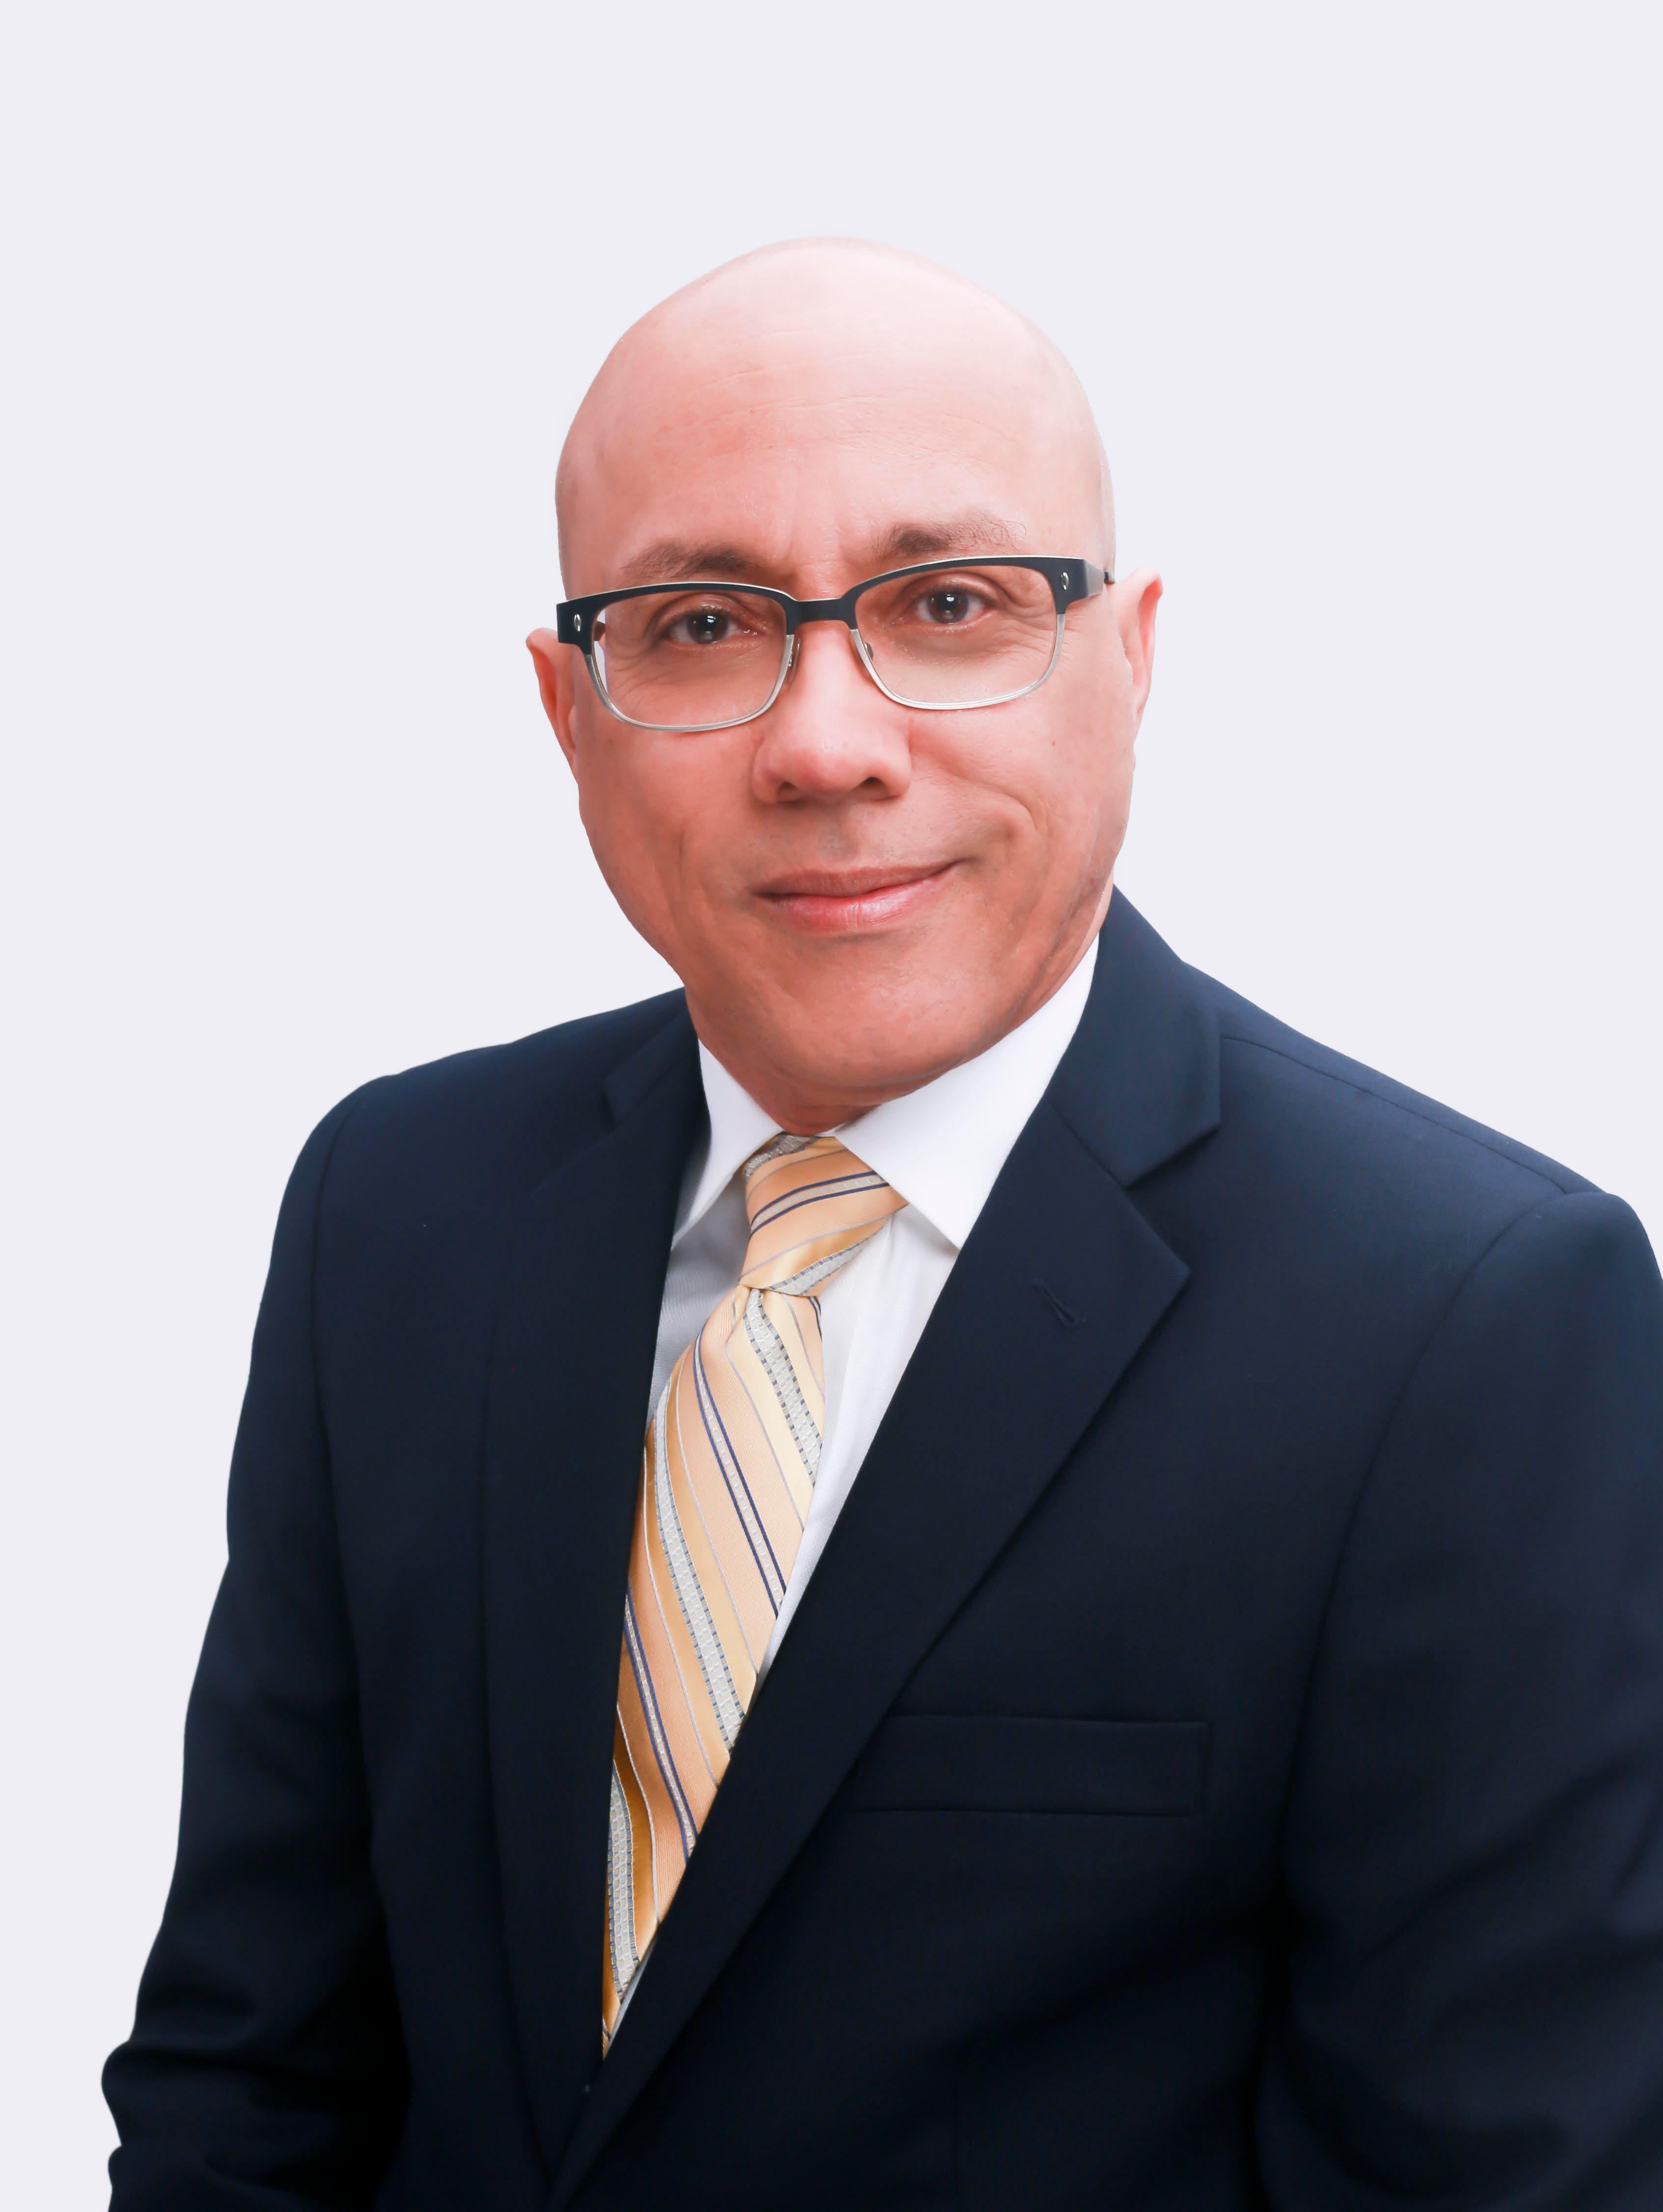 ARAPF nombra nuevo vicepresidente ejecutivo